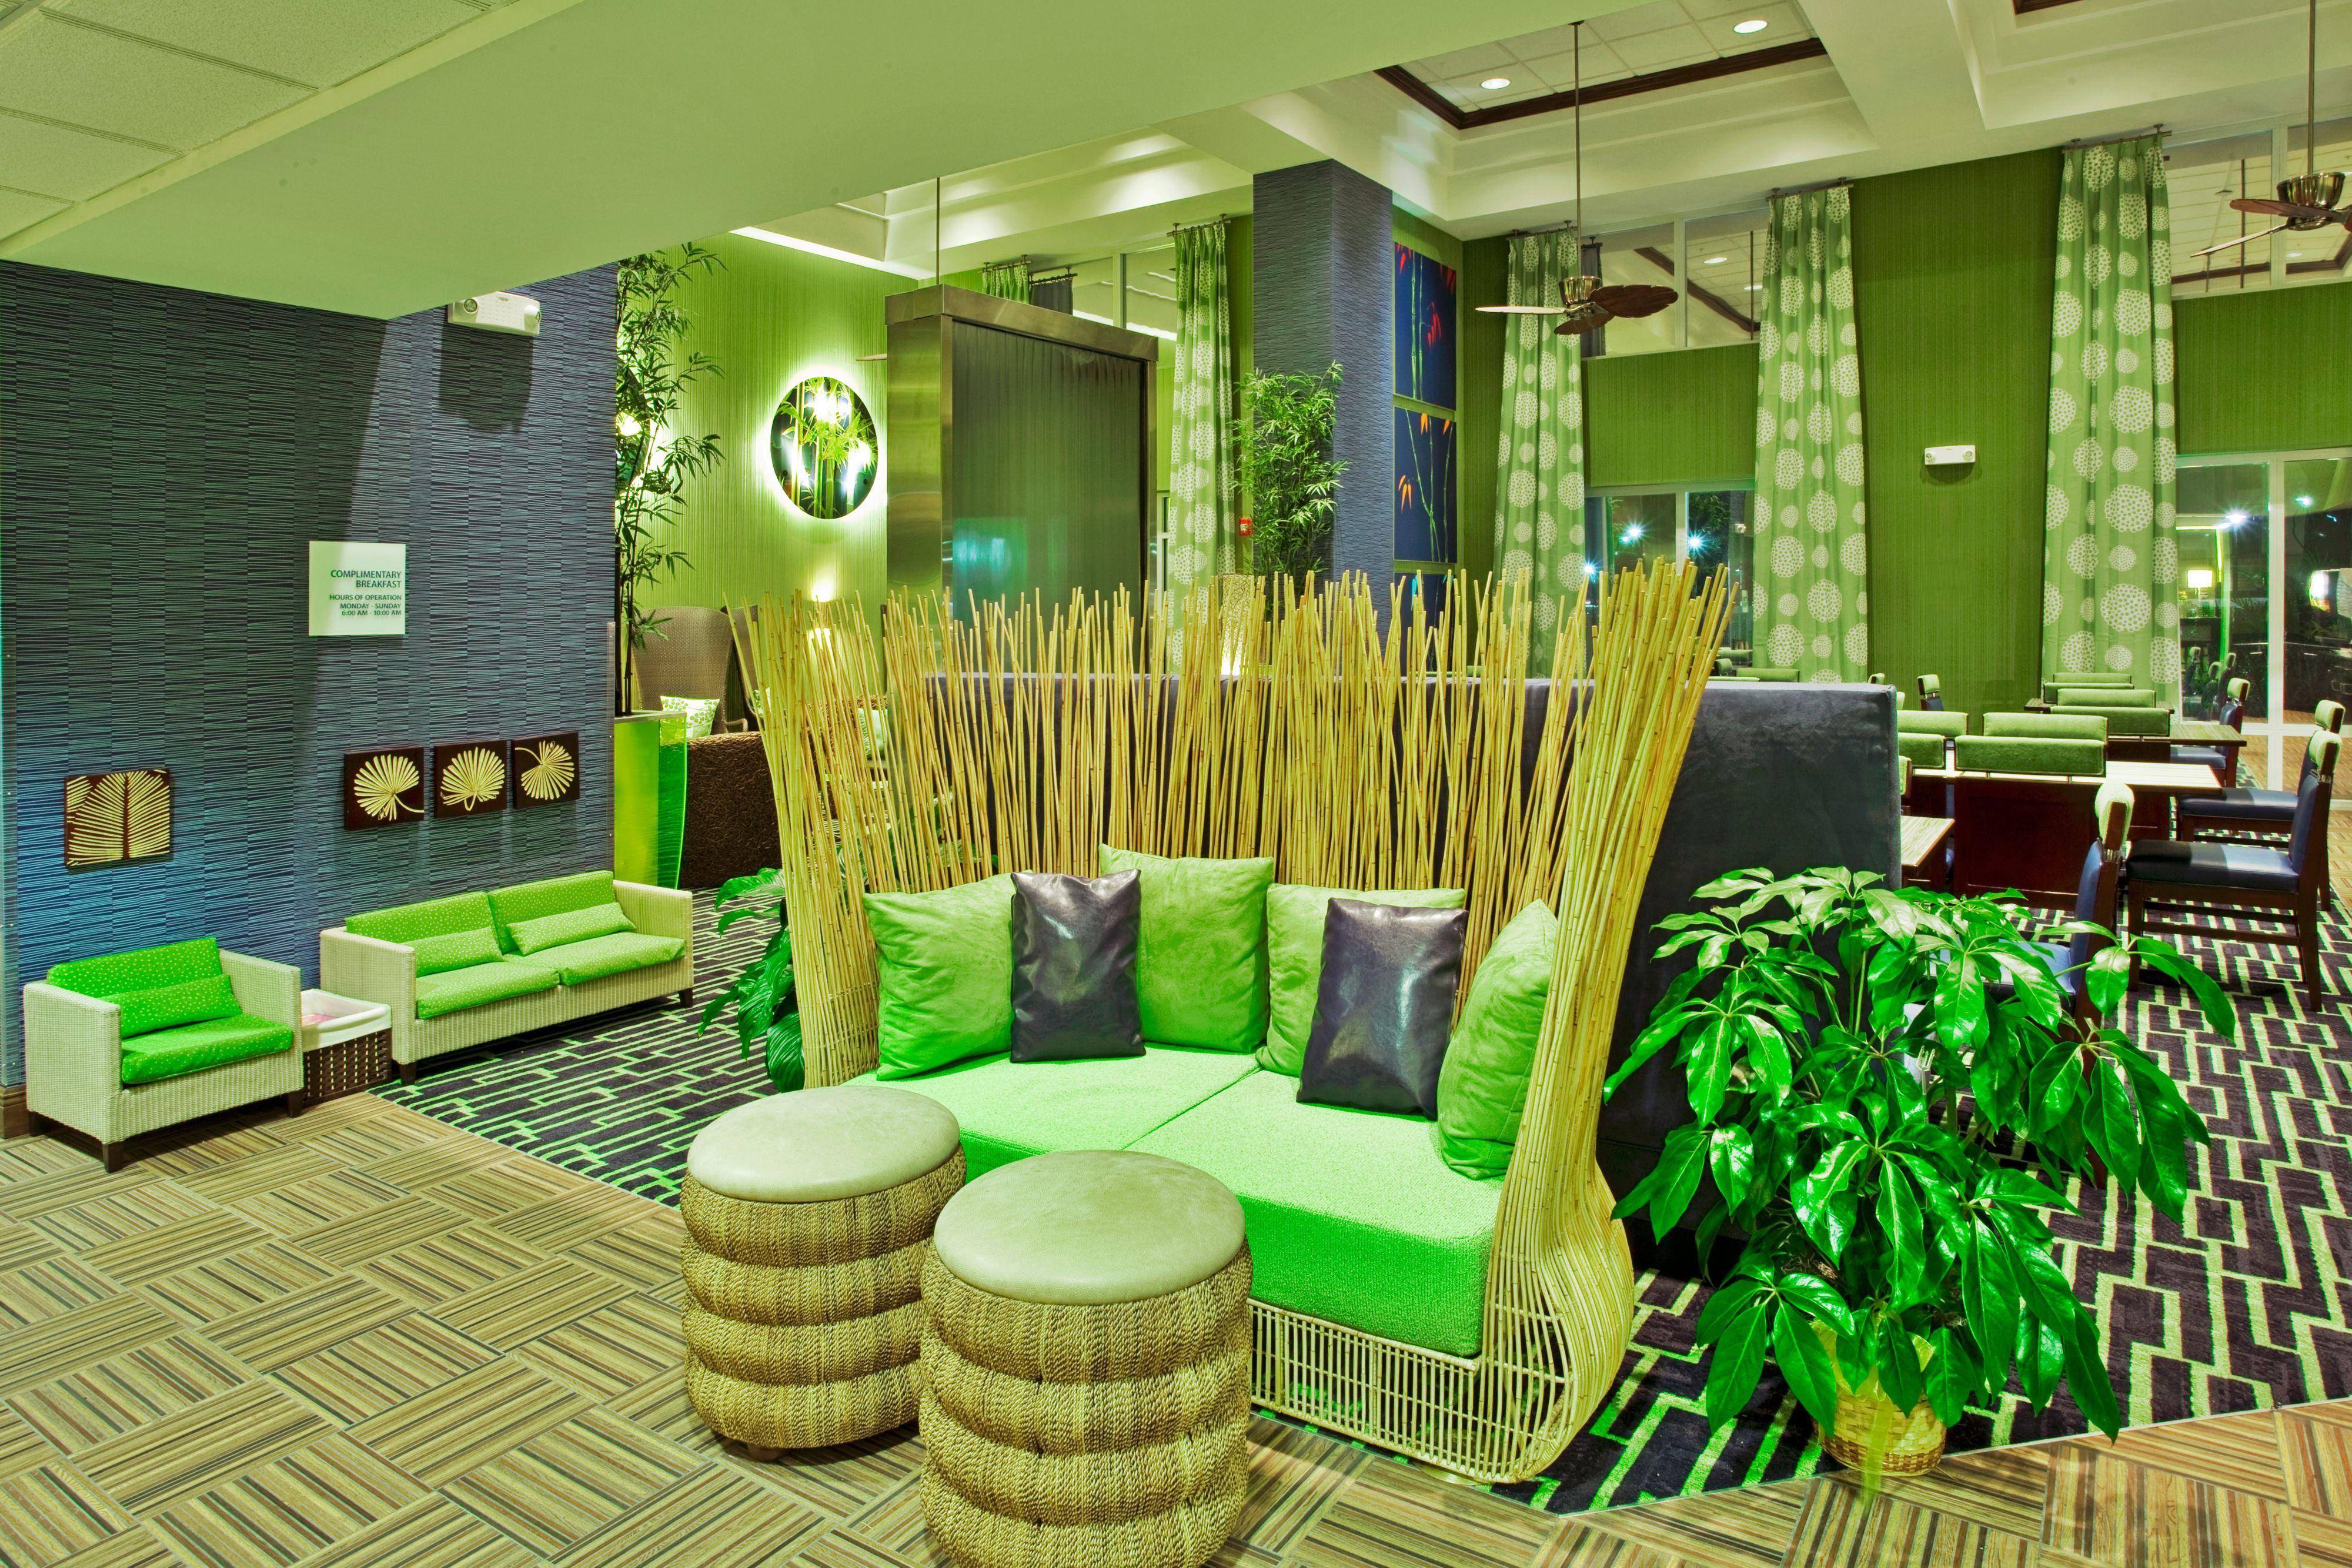 Holiday Inn Express & Suites Orlando - Apopka image 5